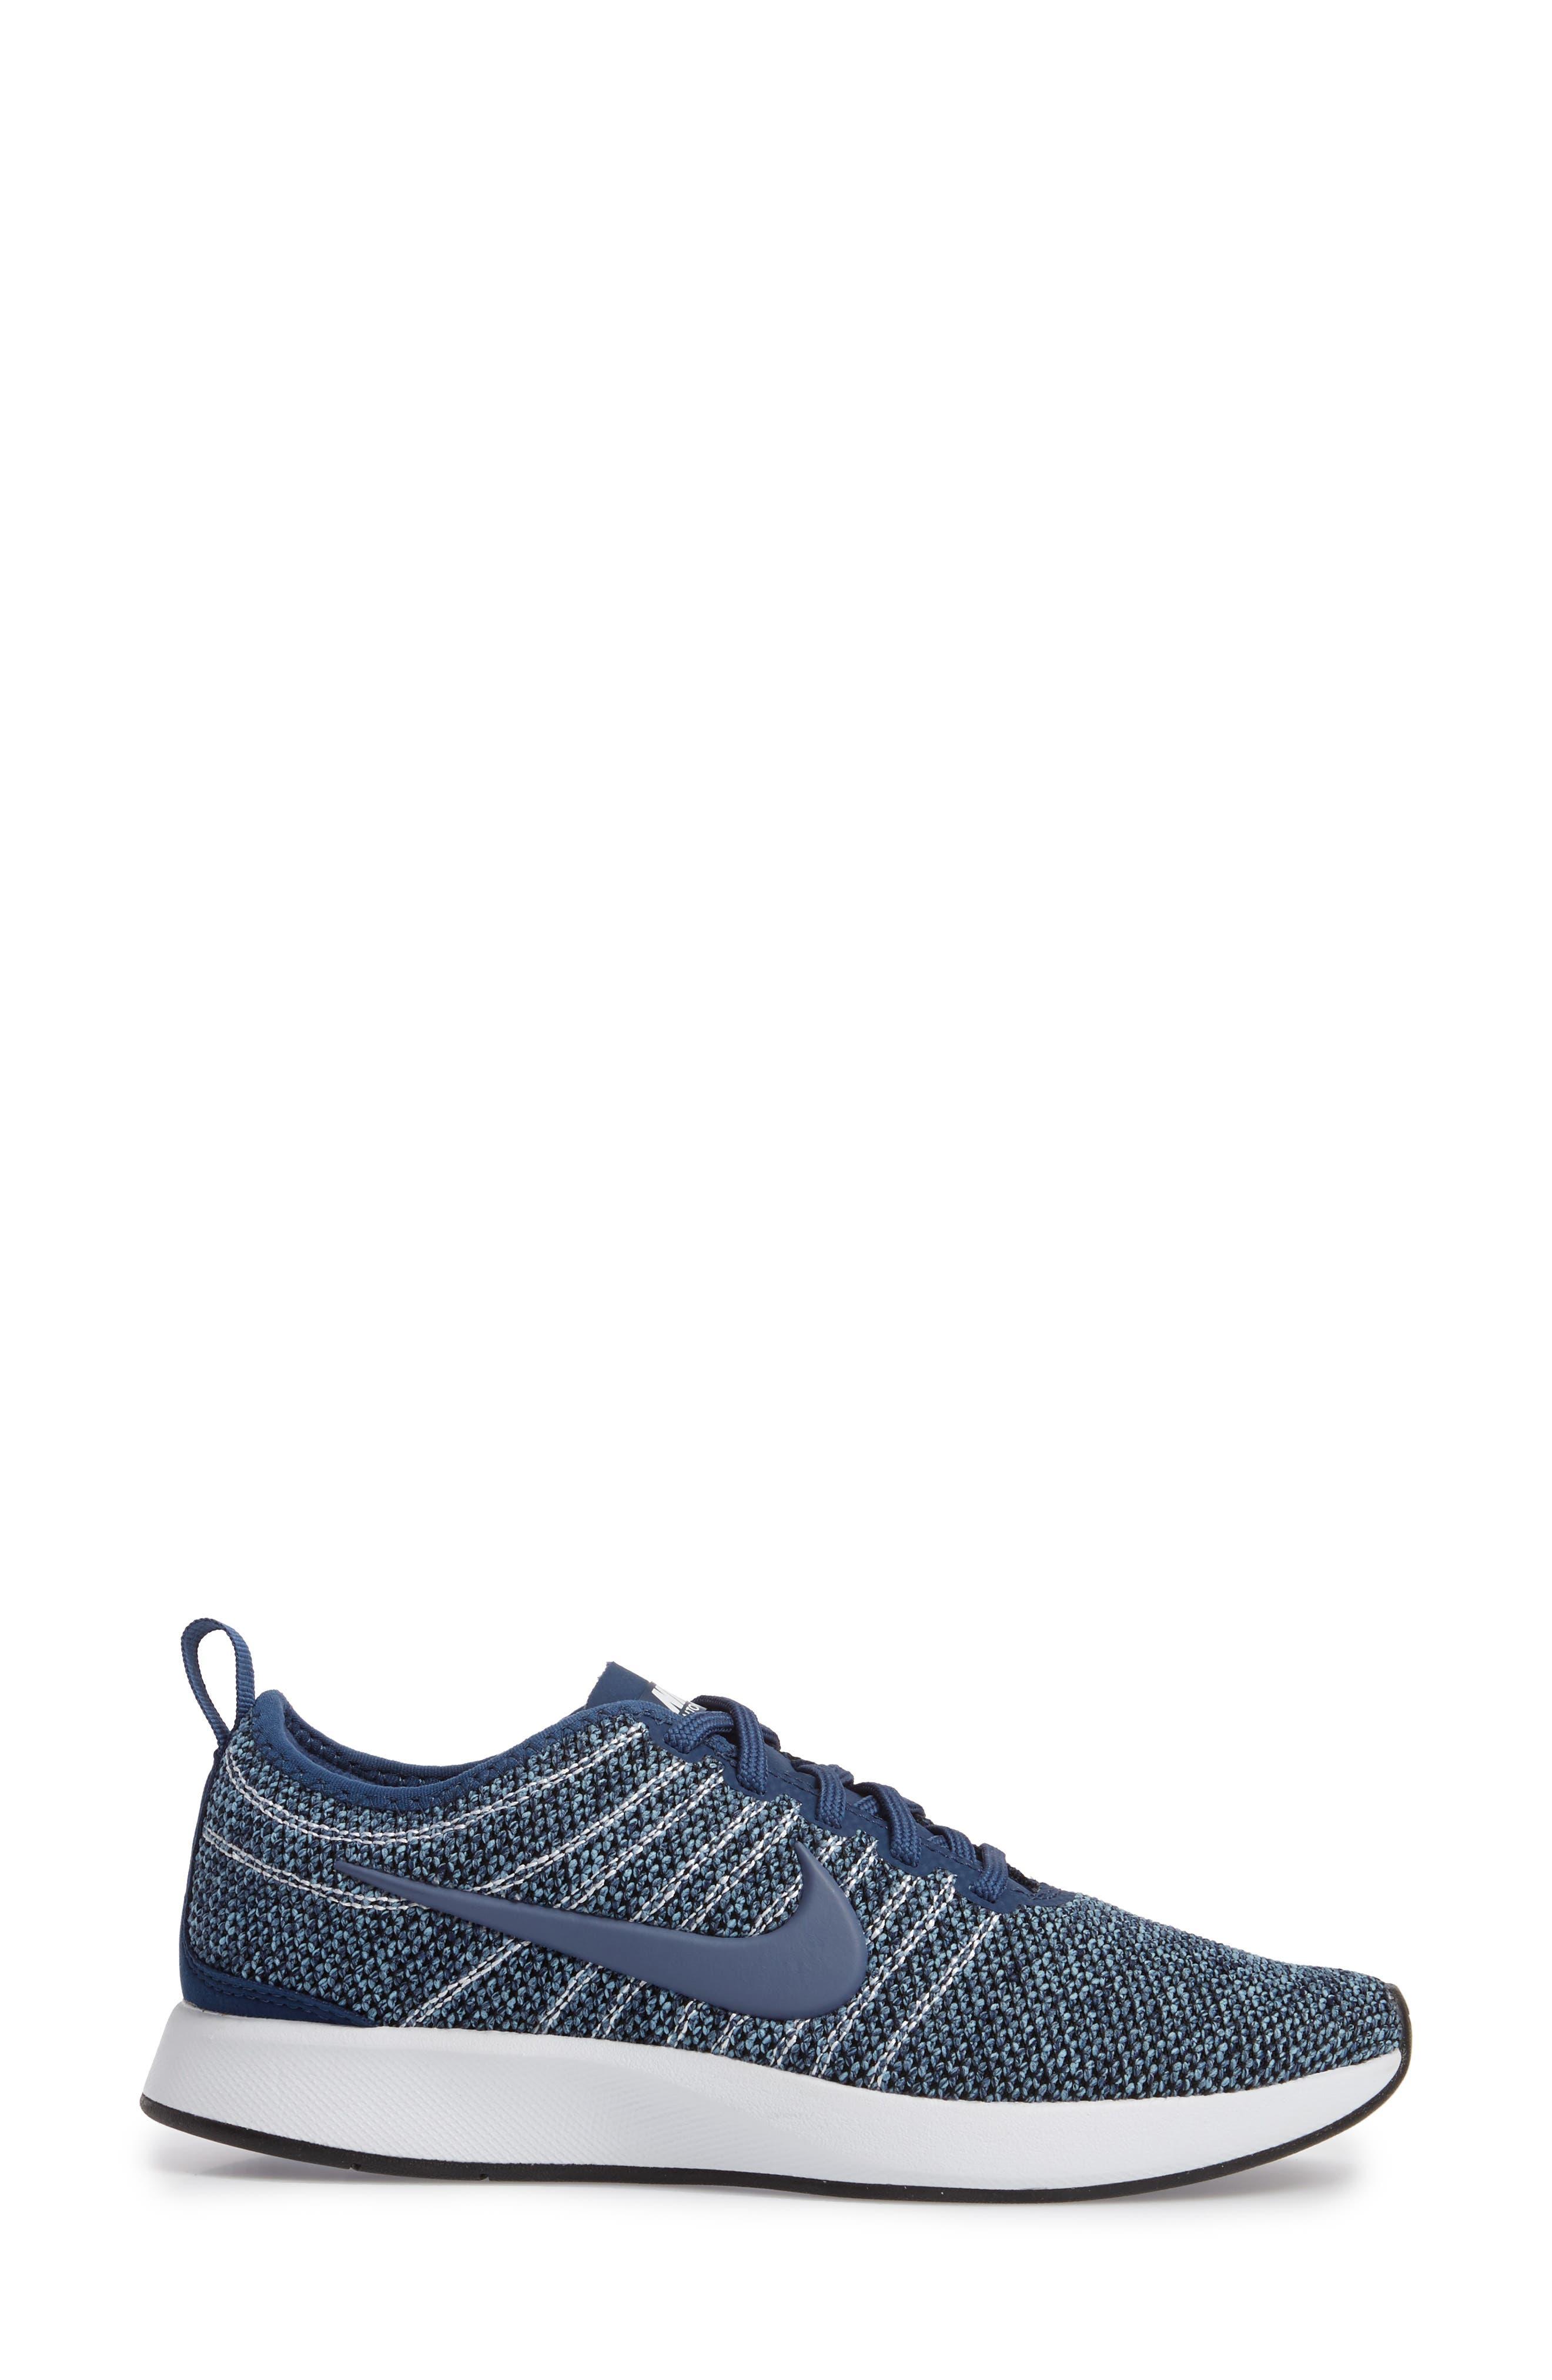 Dualtone Racer PRM Sneaker,                             Alternate thumbnail 10, color,